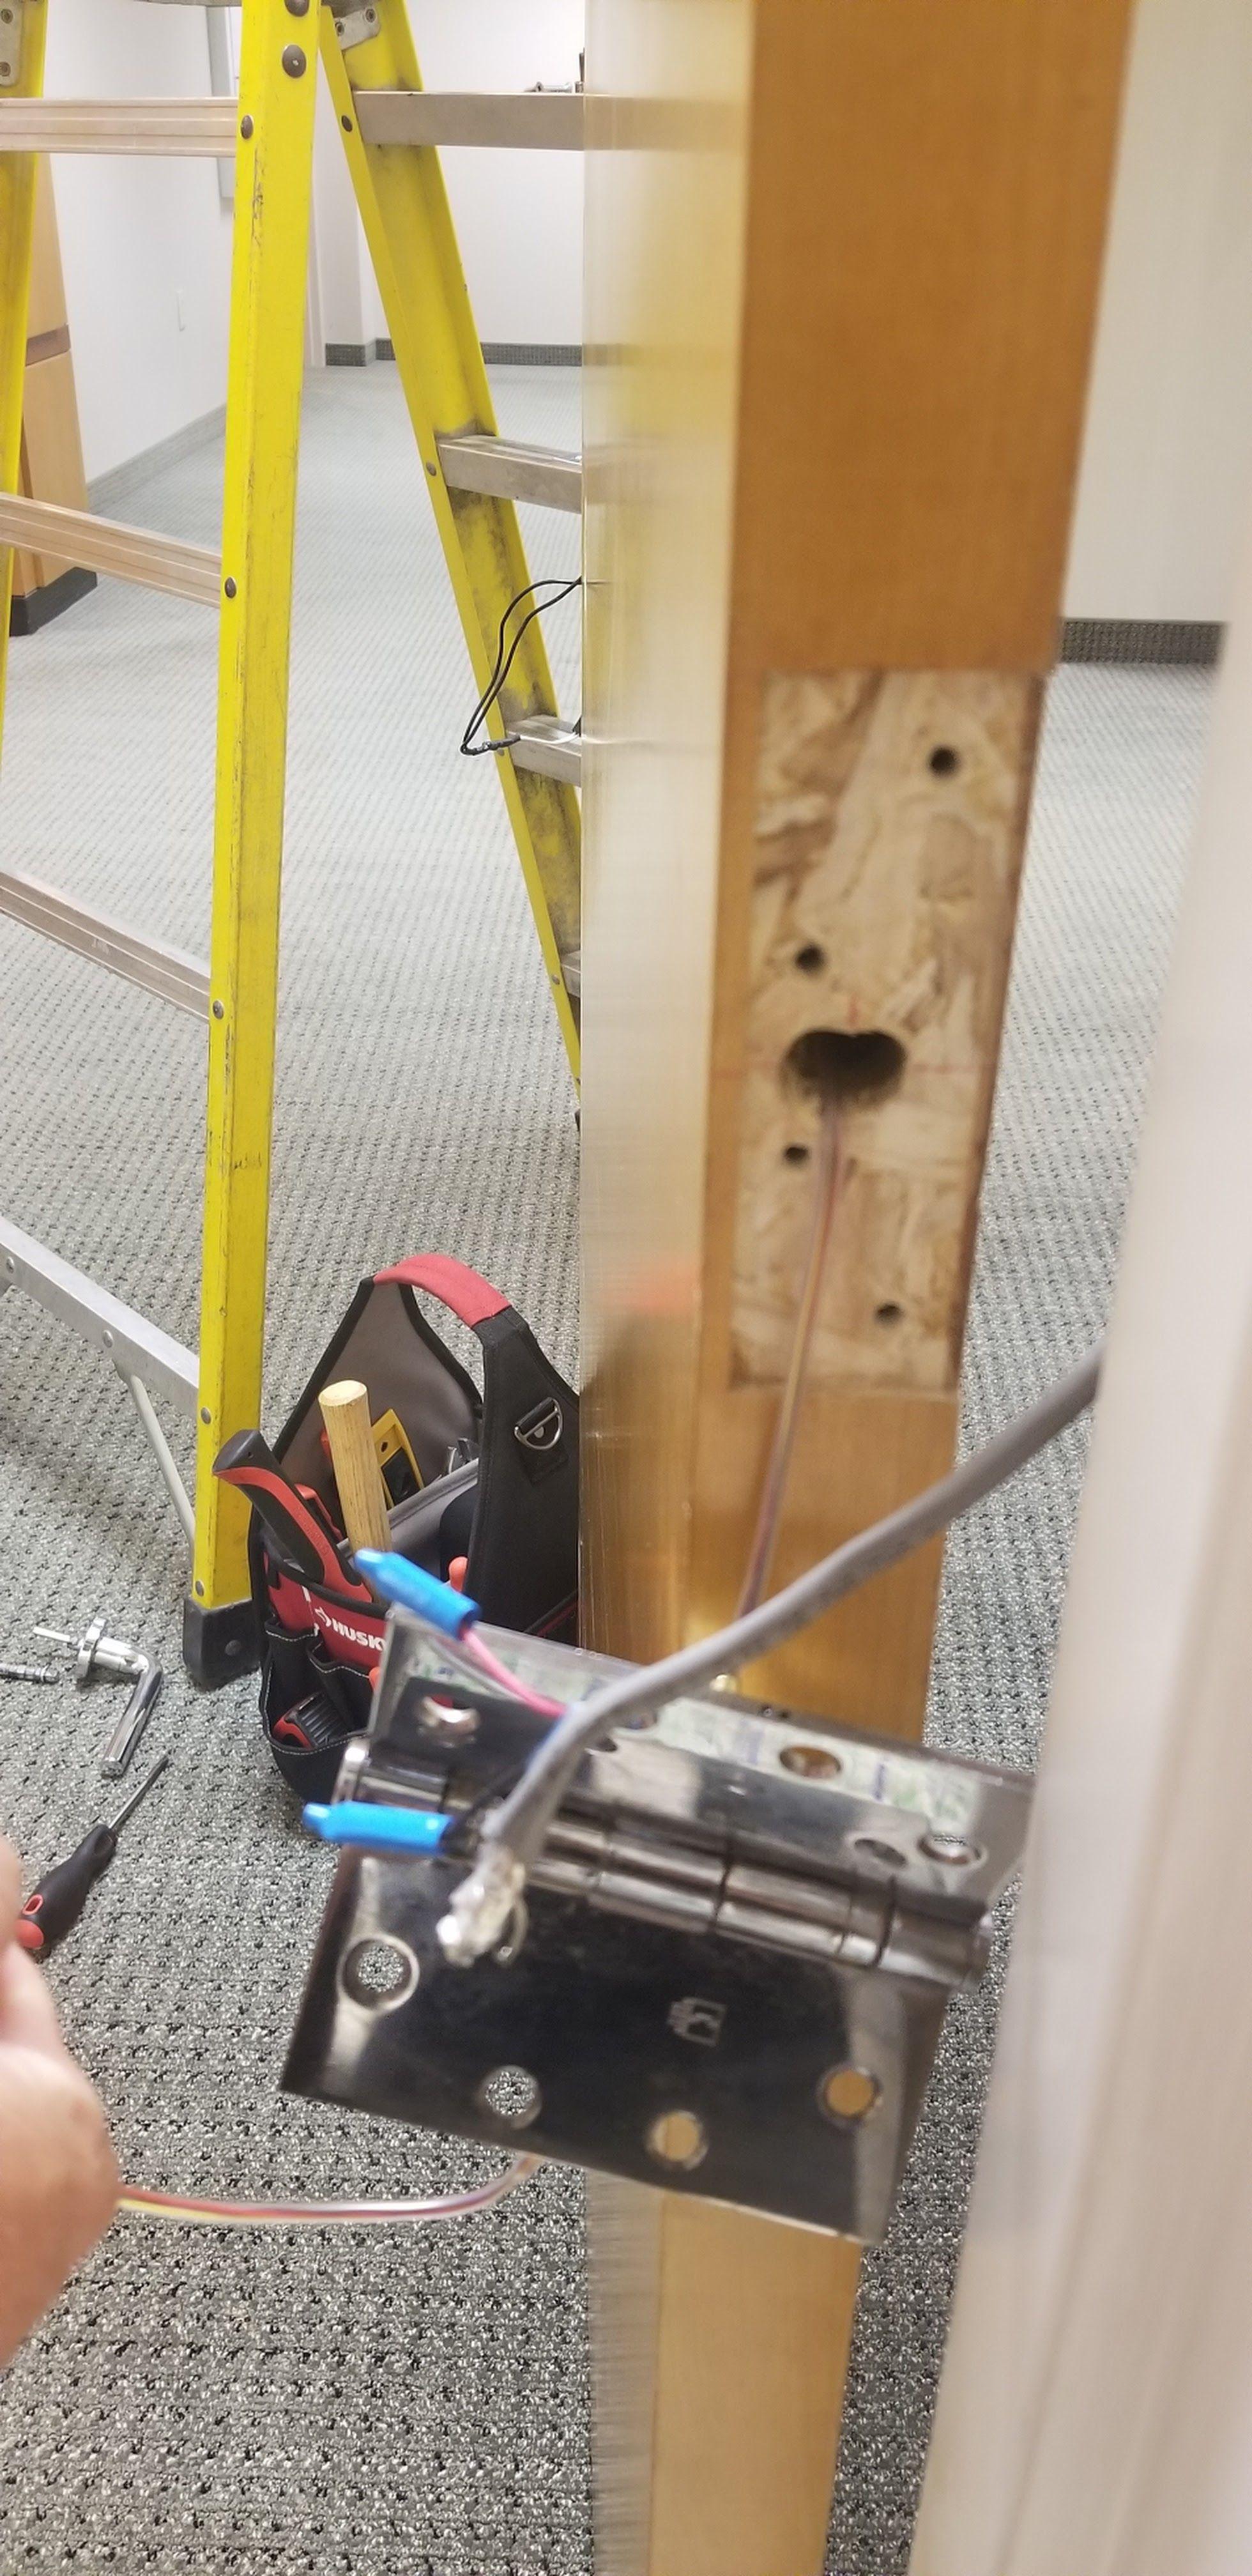 Access control fresh installation Schlage mortise lock